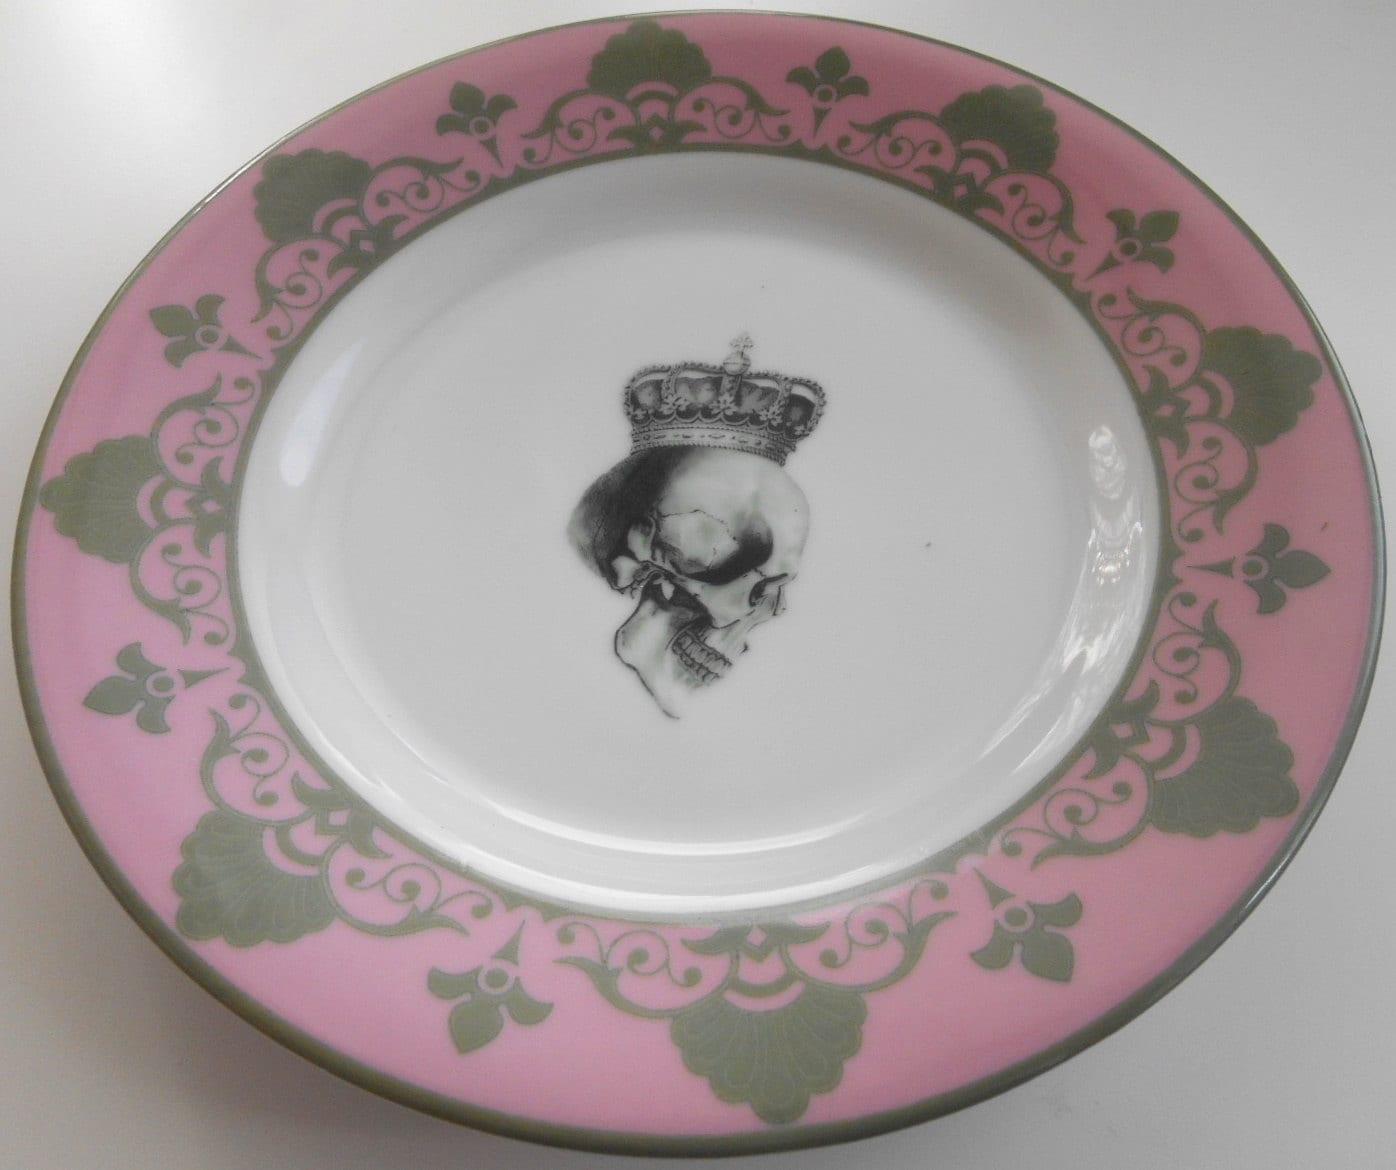 ... goth wedding ste&unk wedding Thanksgiving plates thanksgiving dishes dish skull dinnerware entomology dinnerware insect plates insect dishes  sc 1 st  WTF Porcelain & 4-piece Pink /Gray Skull Dinnerware Set - very